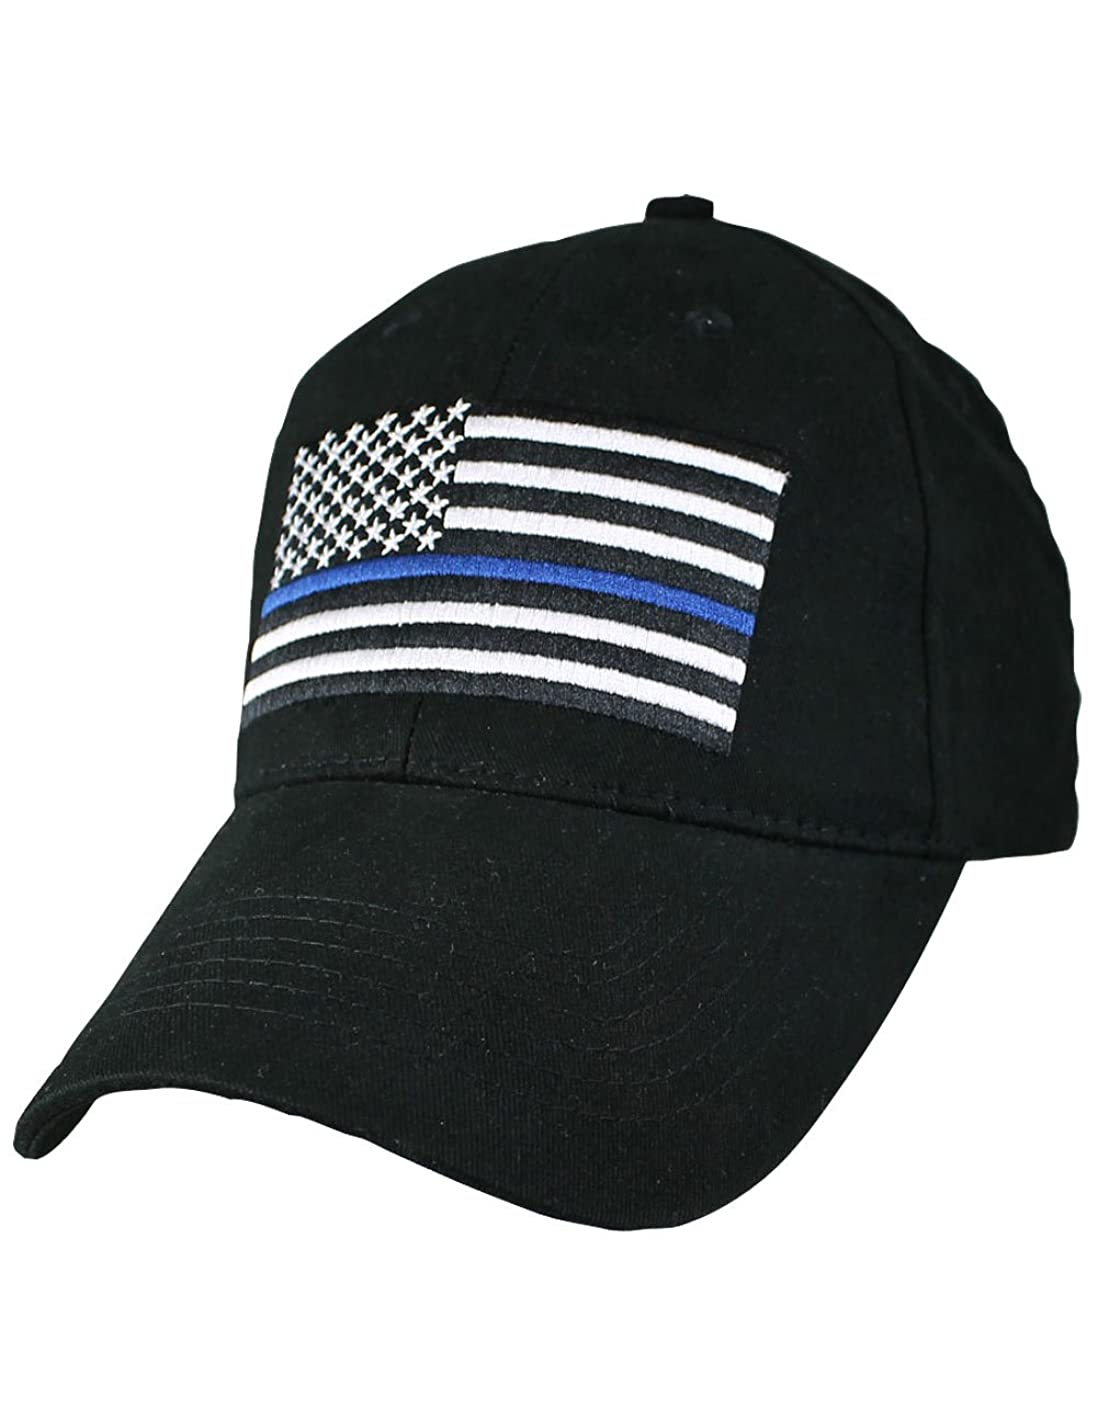 Eagle Crest Police Thin Blue Line with Flag Baseball Cap,Black,Adjustable